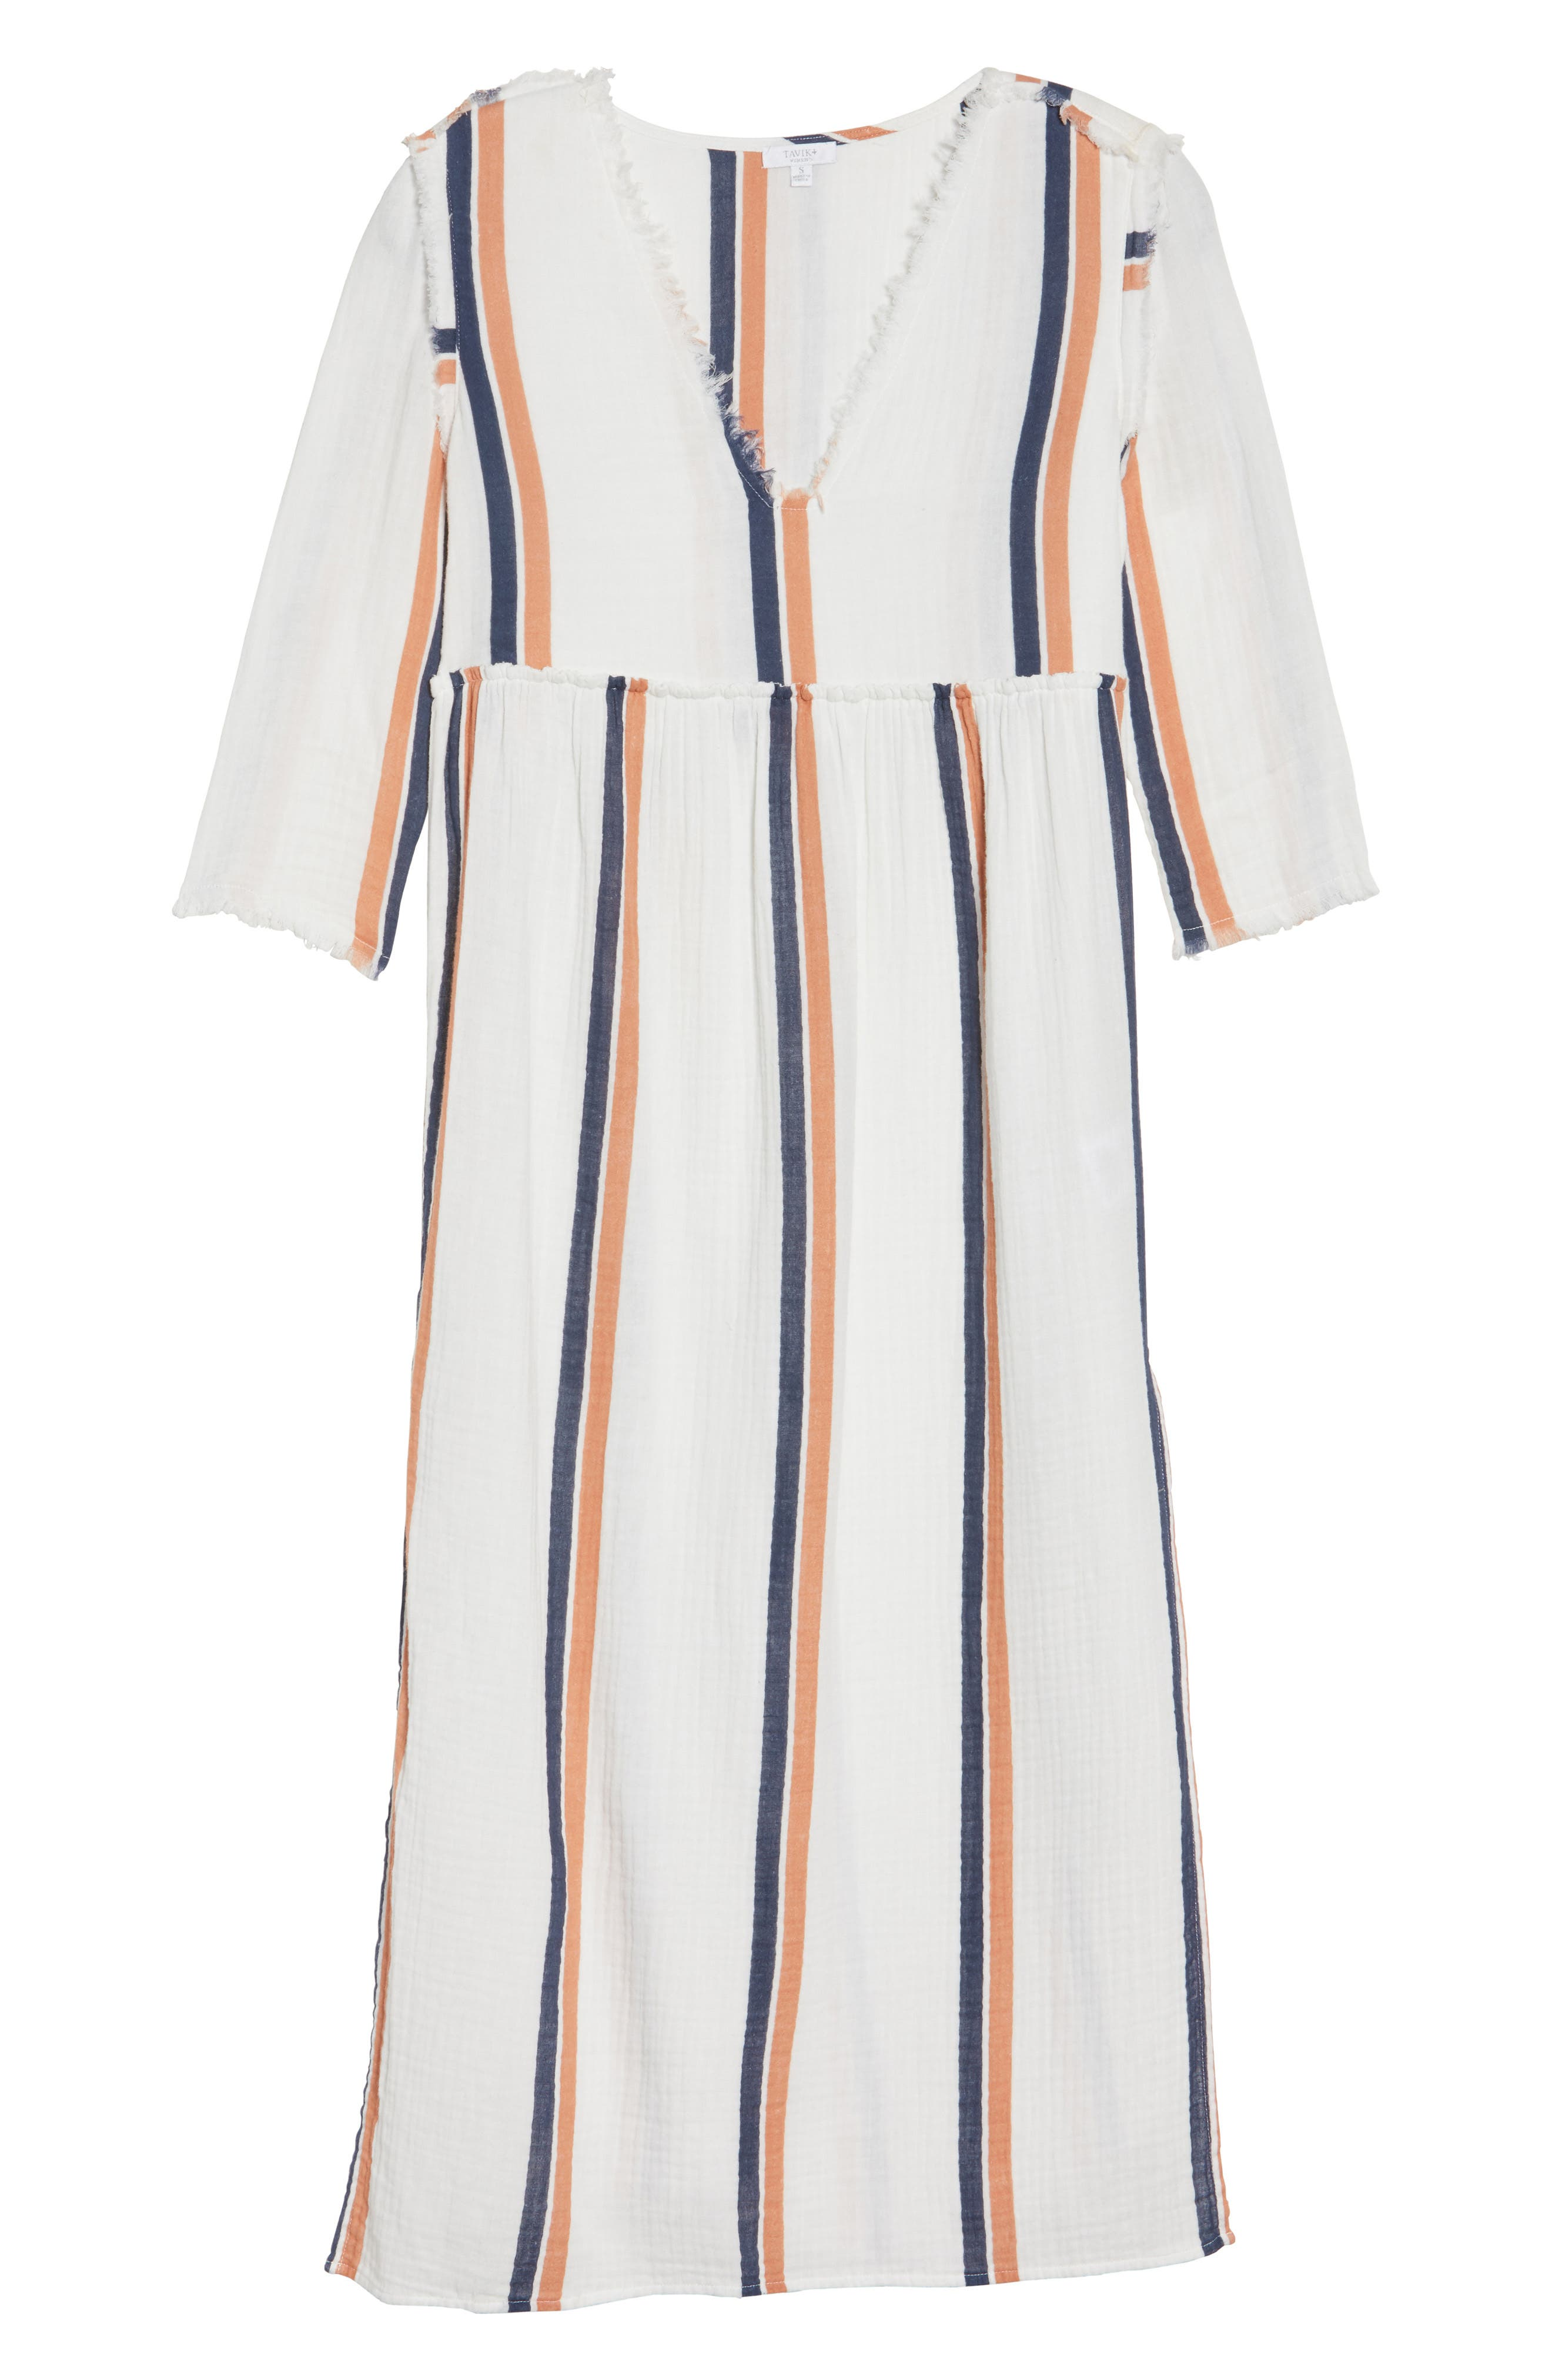 Oria Cover-Up Dress,                             Alternate thumbnail 6, color,                             Augustus Desert Clay